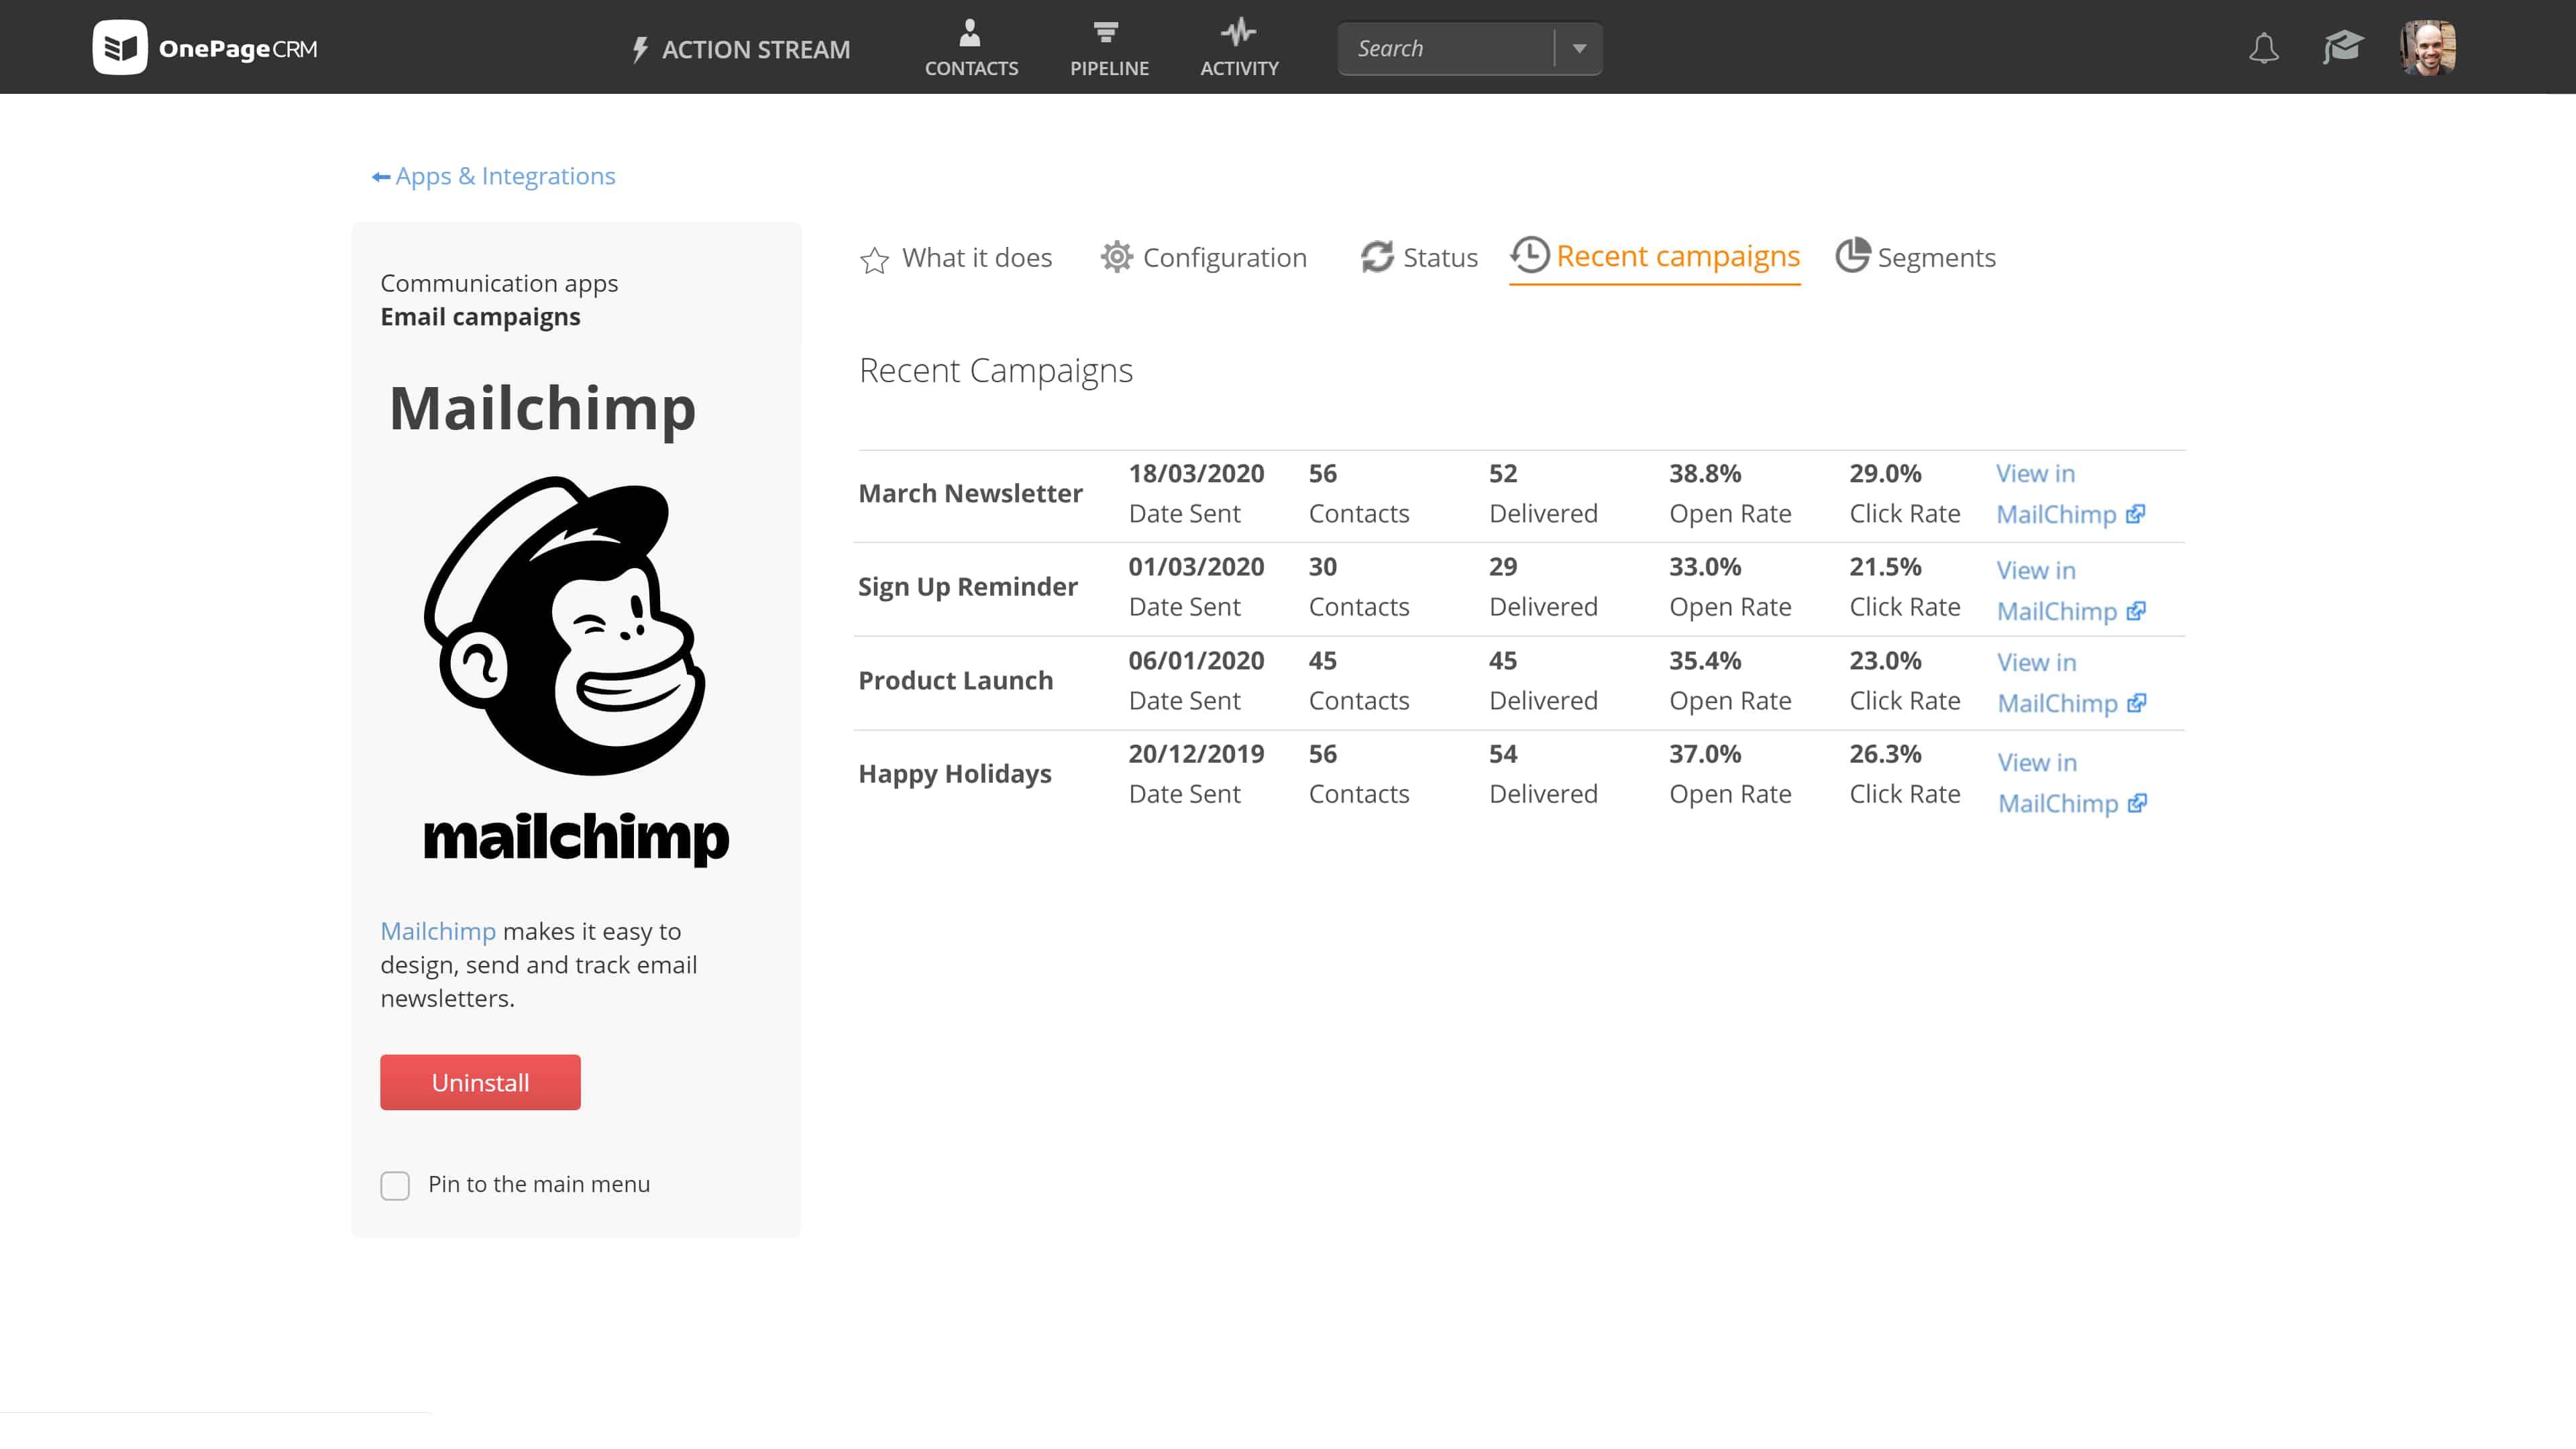 OnePageCRM Mailchimp CRM integration